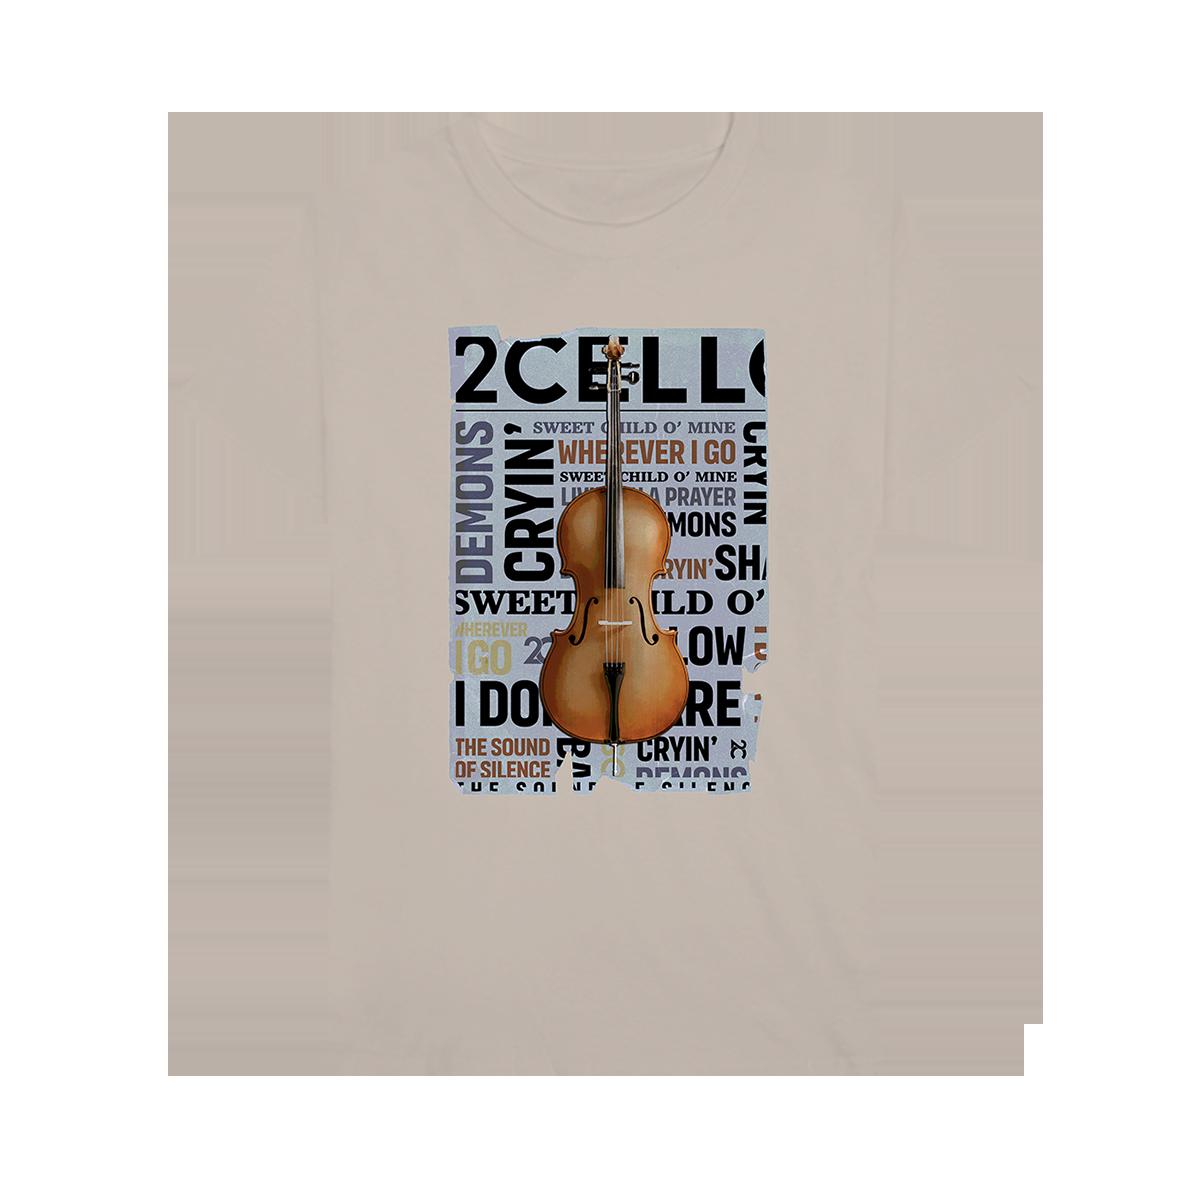 Buy Online 2 Cellos - 2CELLOS Newspaper Tan T-Shirt